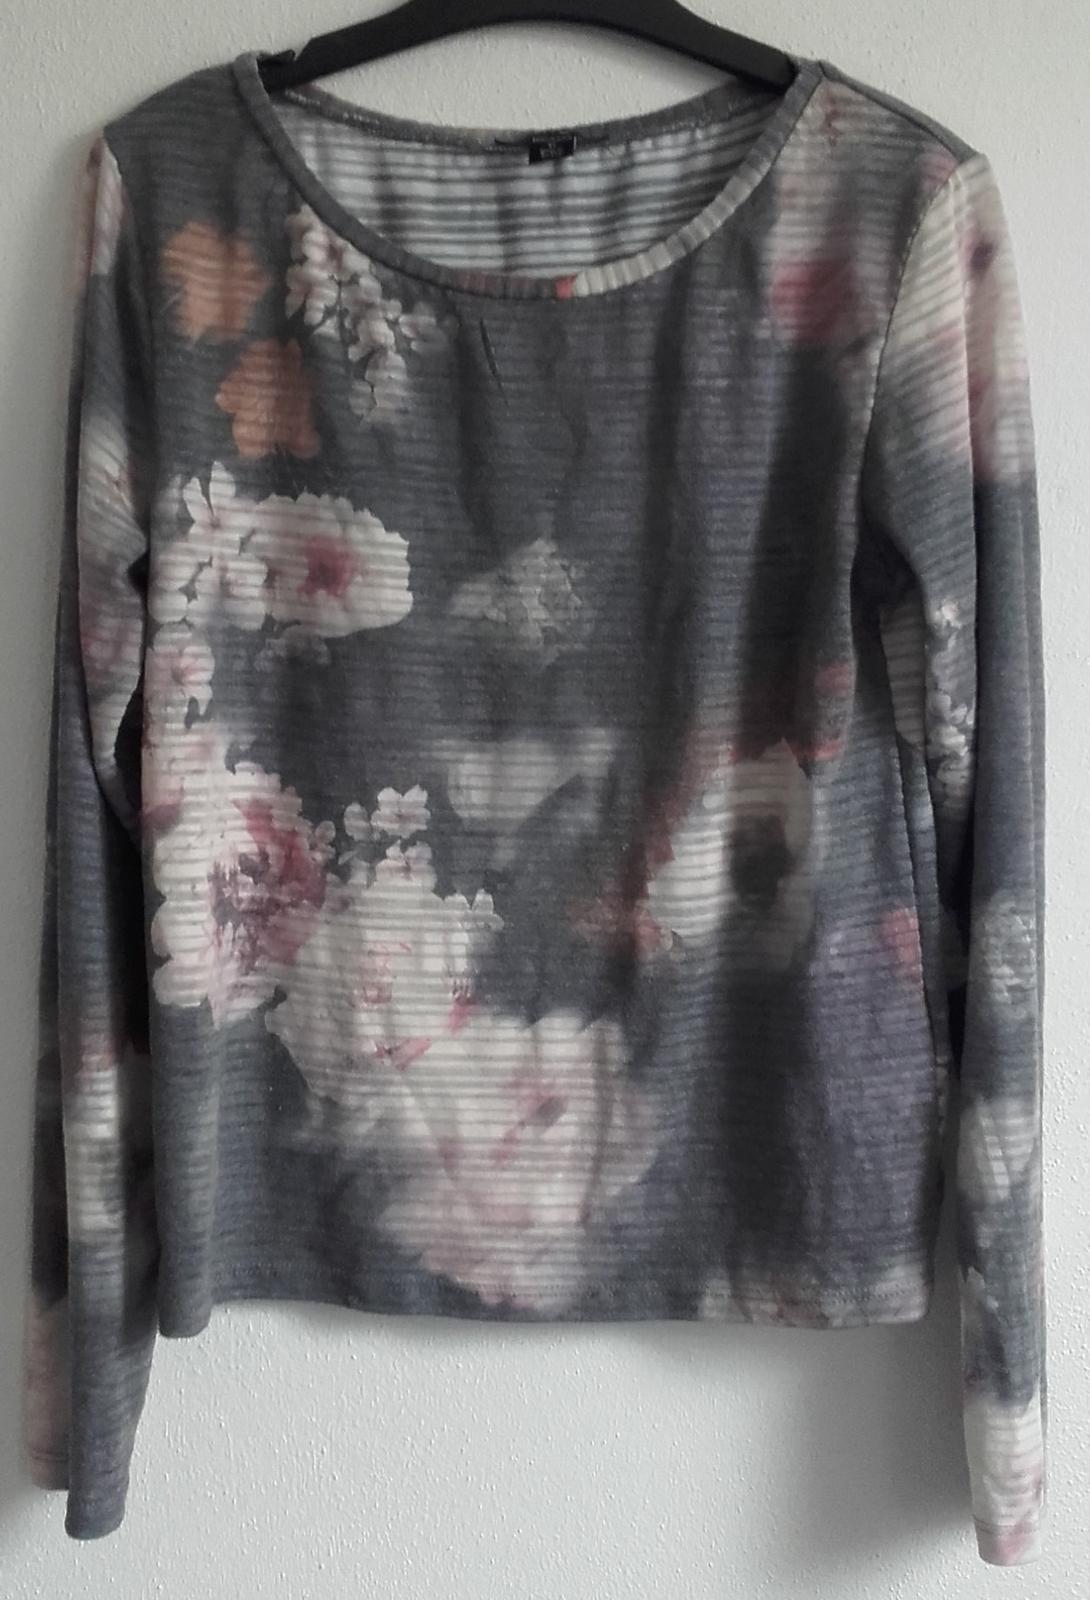 Tričko  - Obrázek č. 1